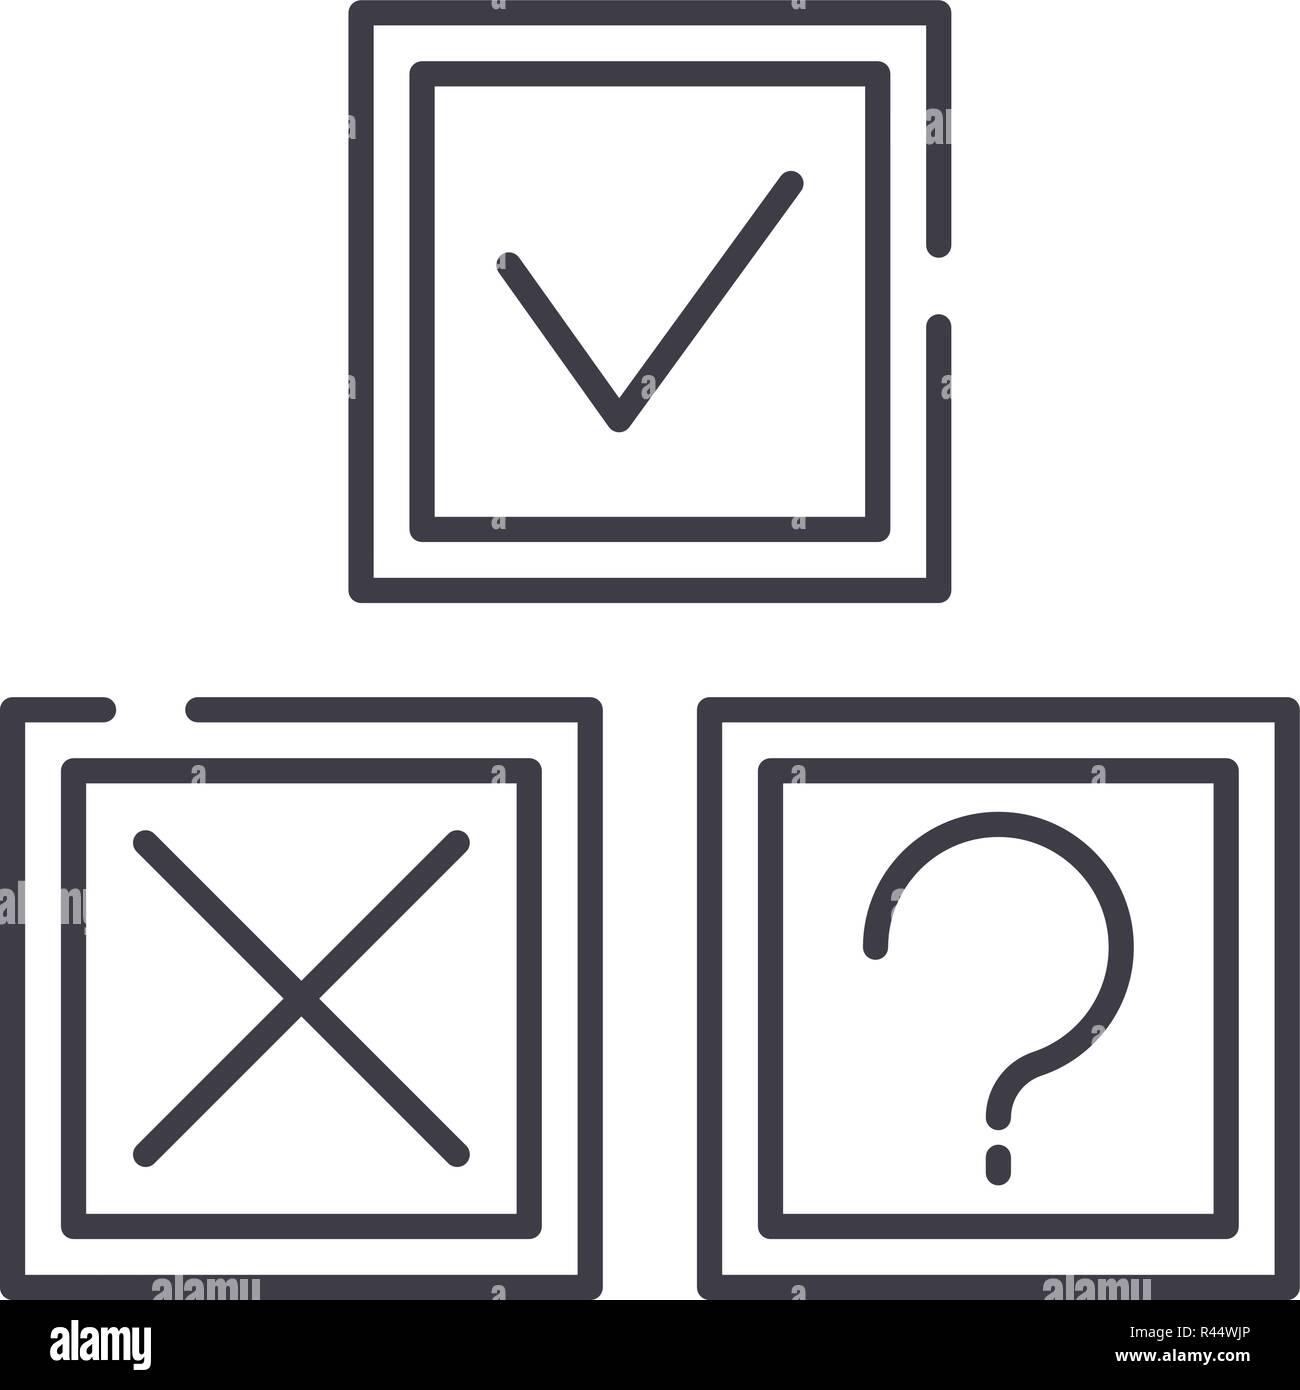 Rebus line icon concept. Rebus vector linear illustration, symbol, sign - Stock Image